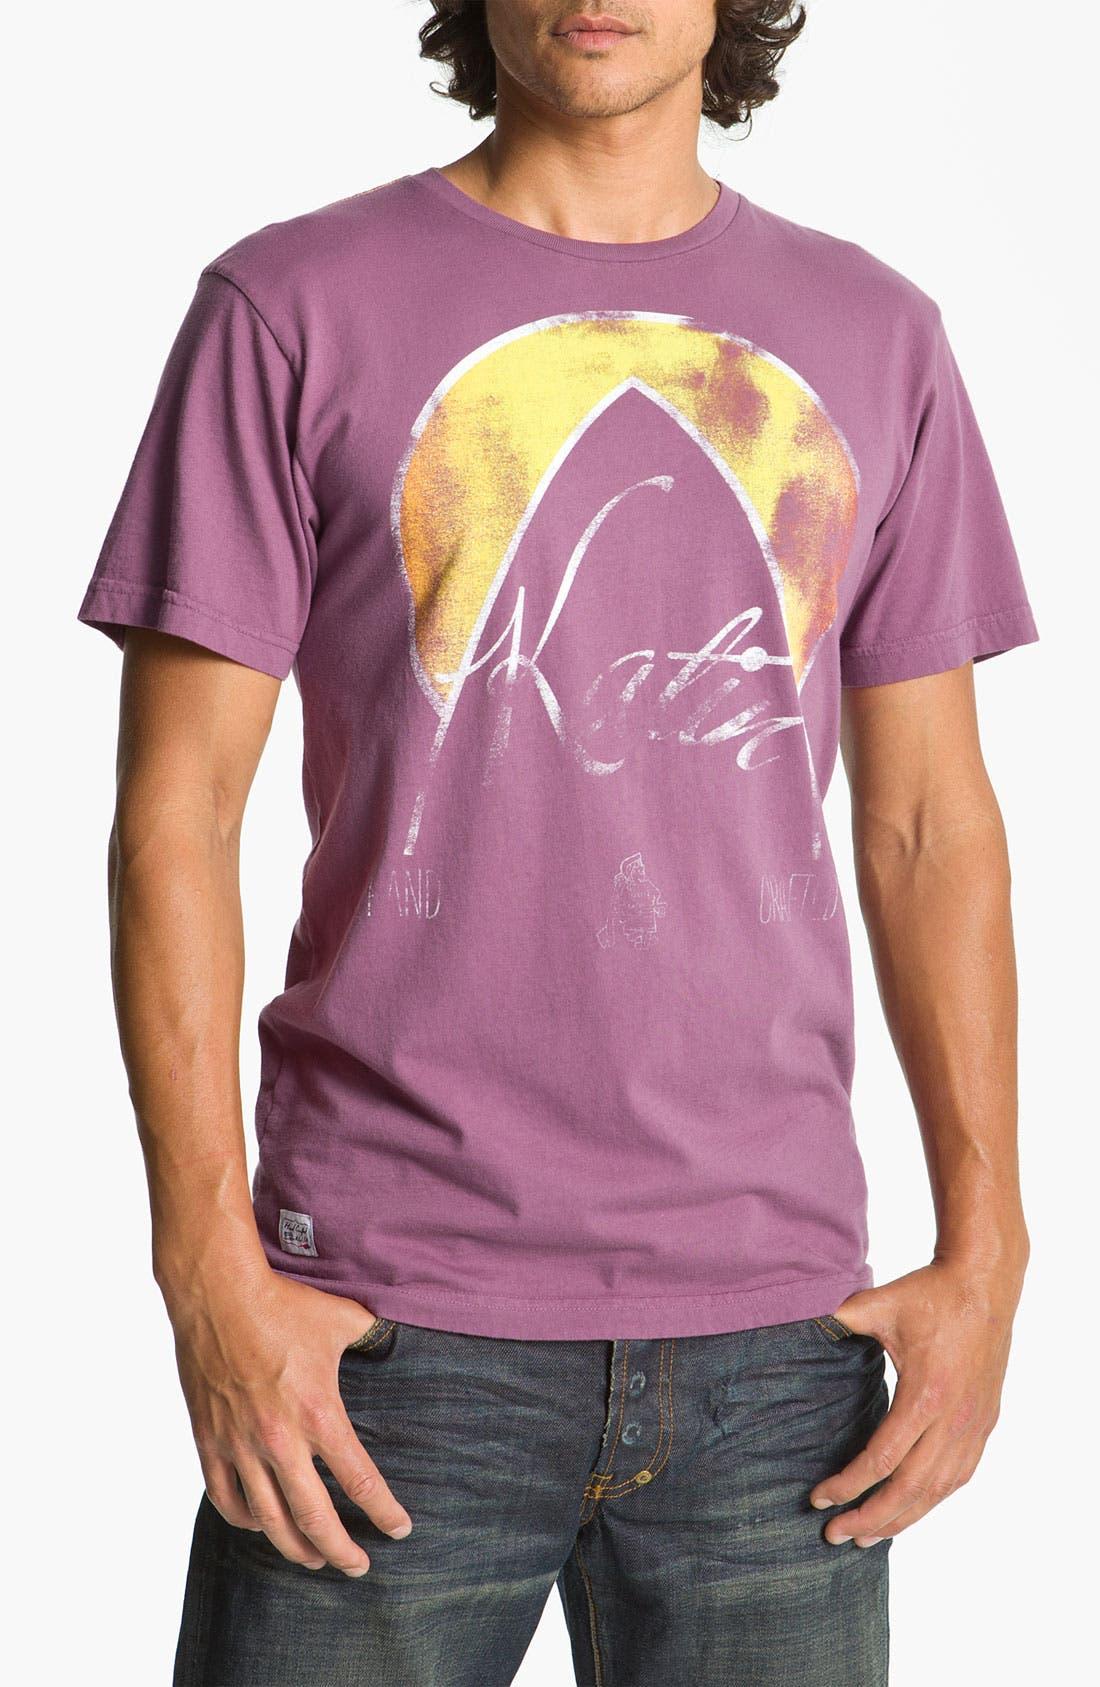 Alternate Image 1 Selected - Katin 'Nose' Graphic T-Shirt